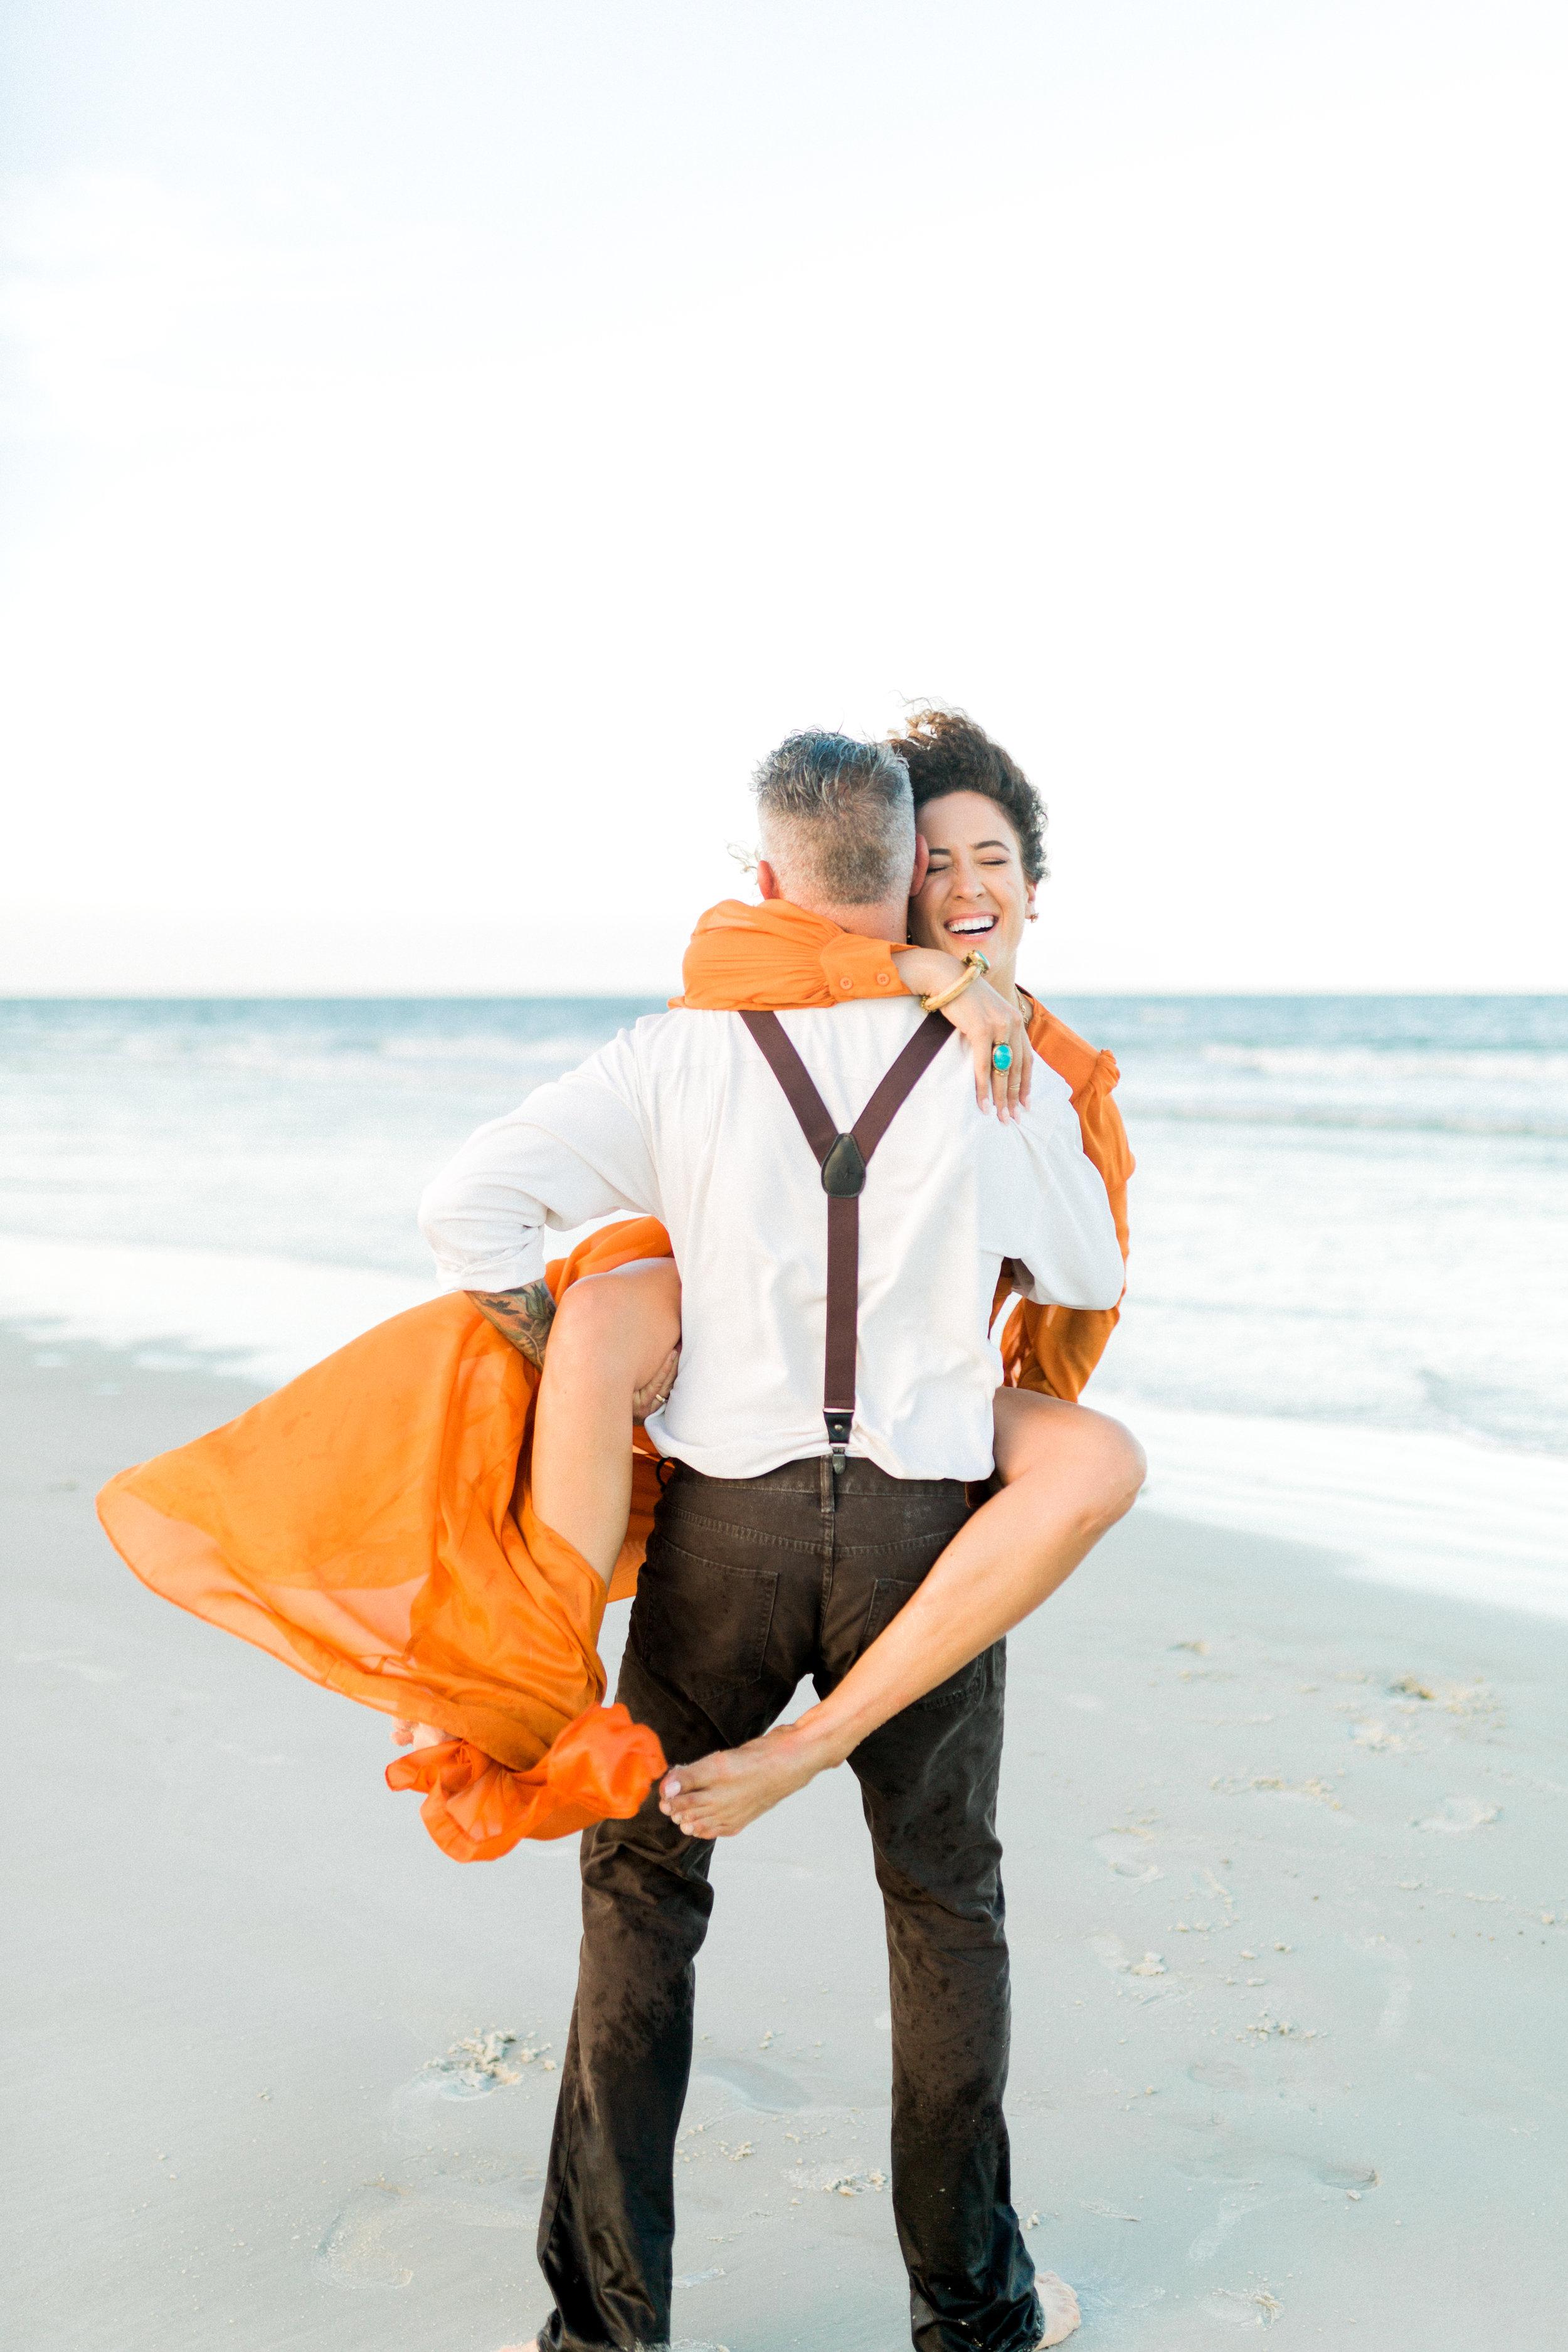 St. Augustine Beach A1A Anniversary Photos of stylish couple. fine art film photography